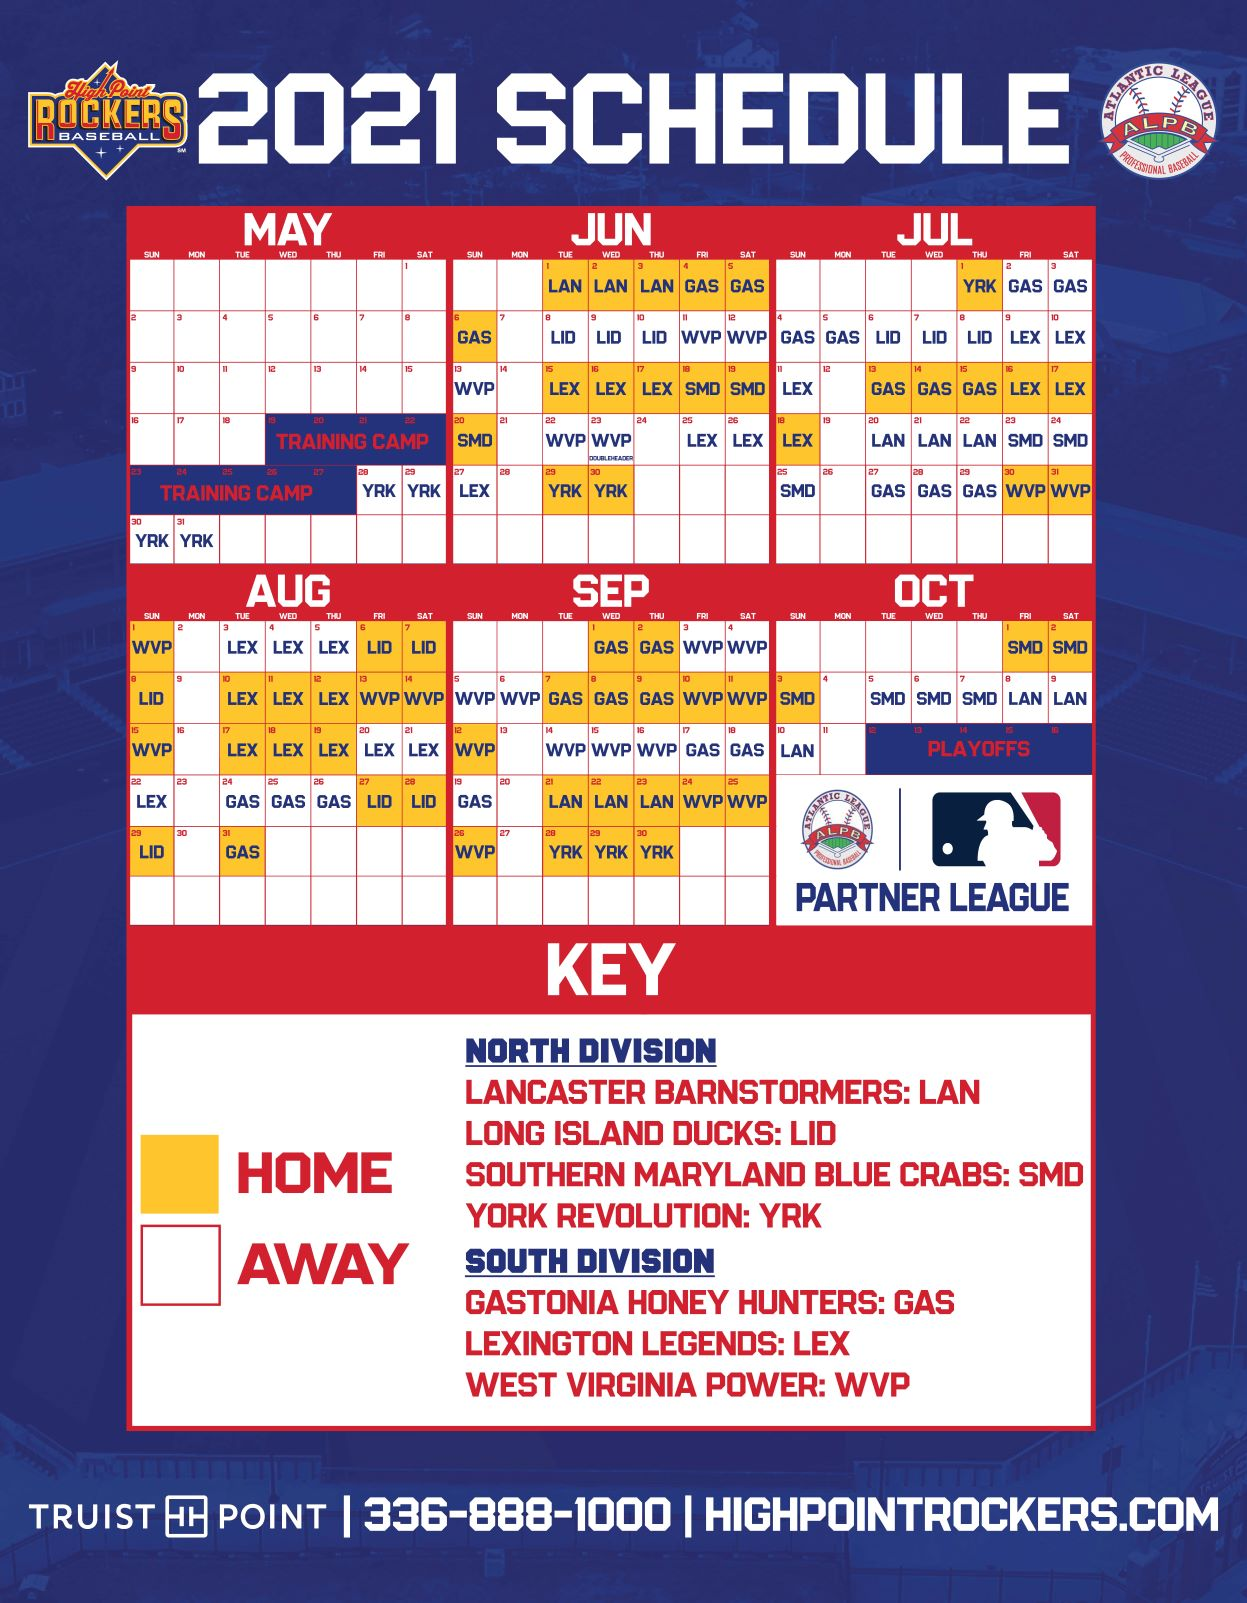 PLAY BALL - High Point Rockers announce 2021 Baseball Season at Truist Point